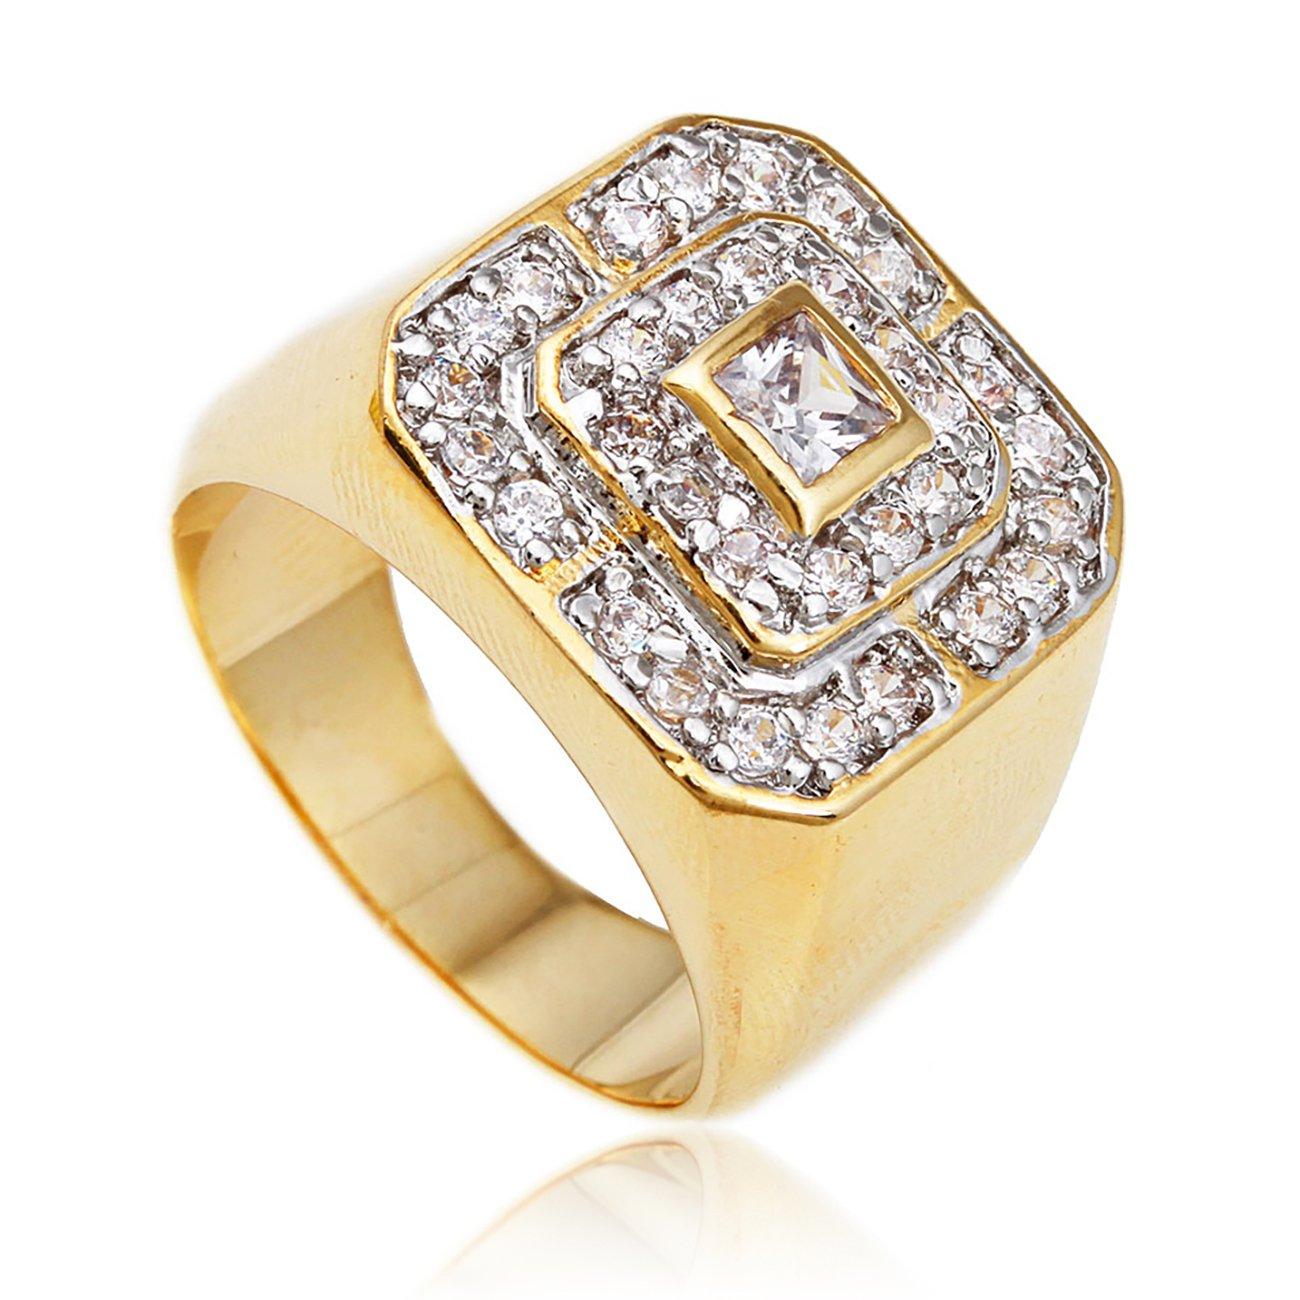 Men's Goldtone CZ Layered Squares Ring Sizes 7-17 (7) (D-922-7)